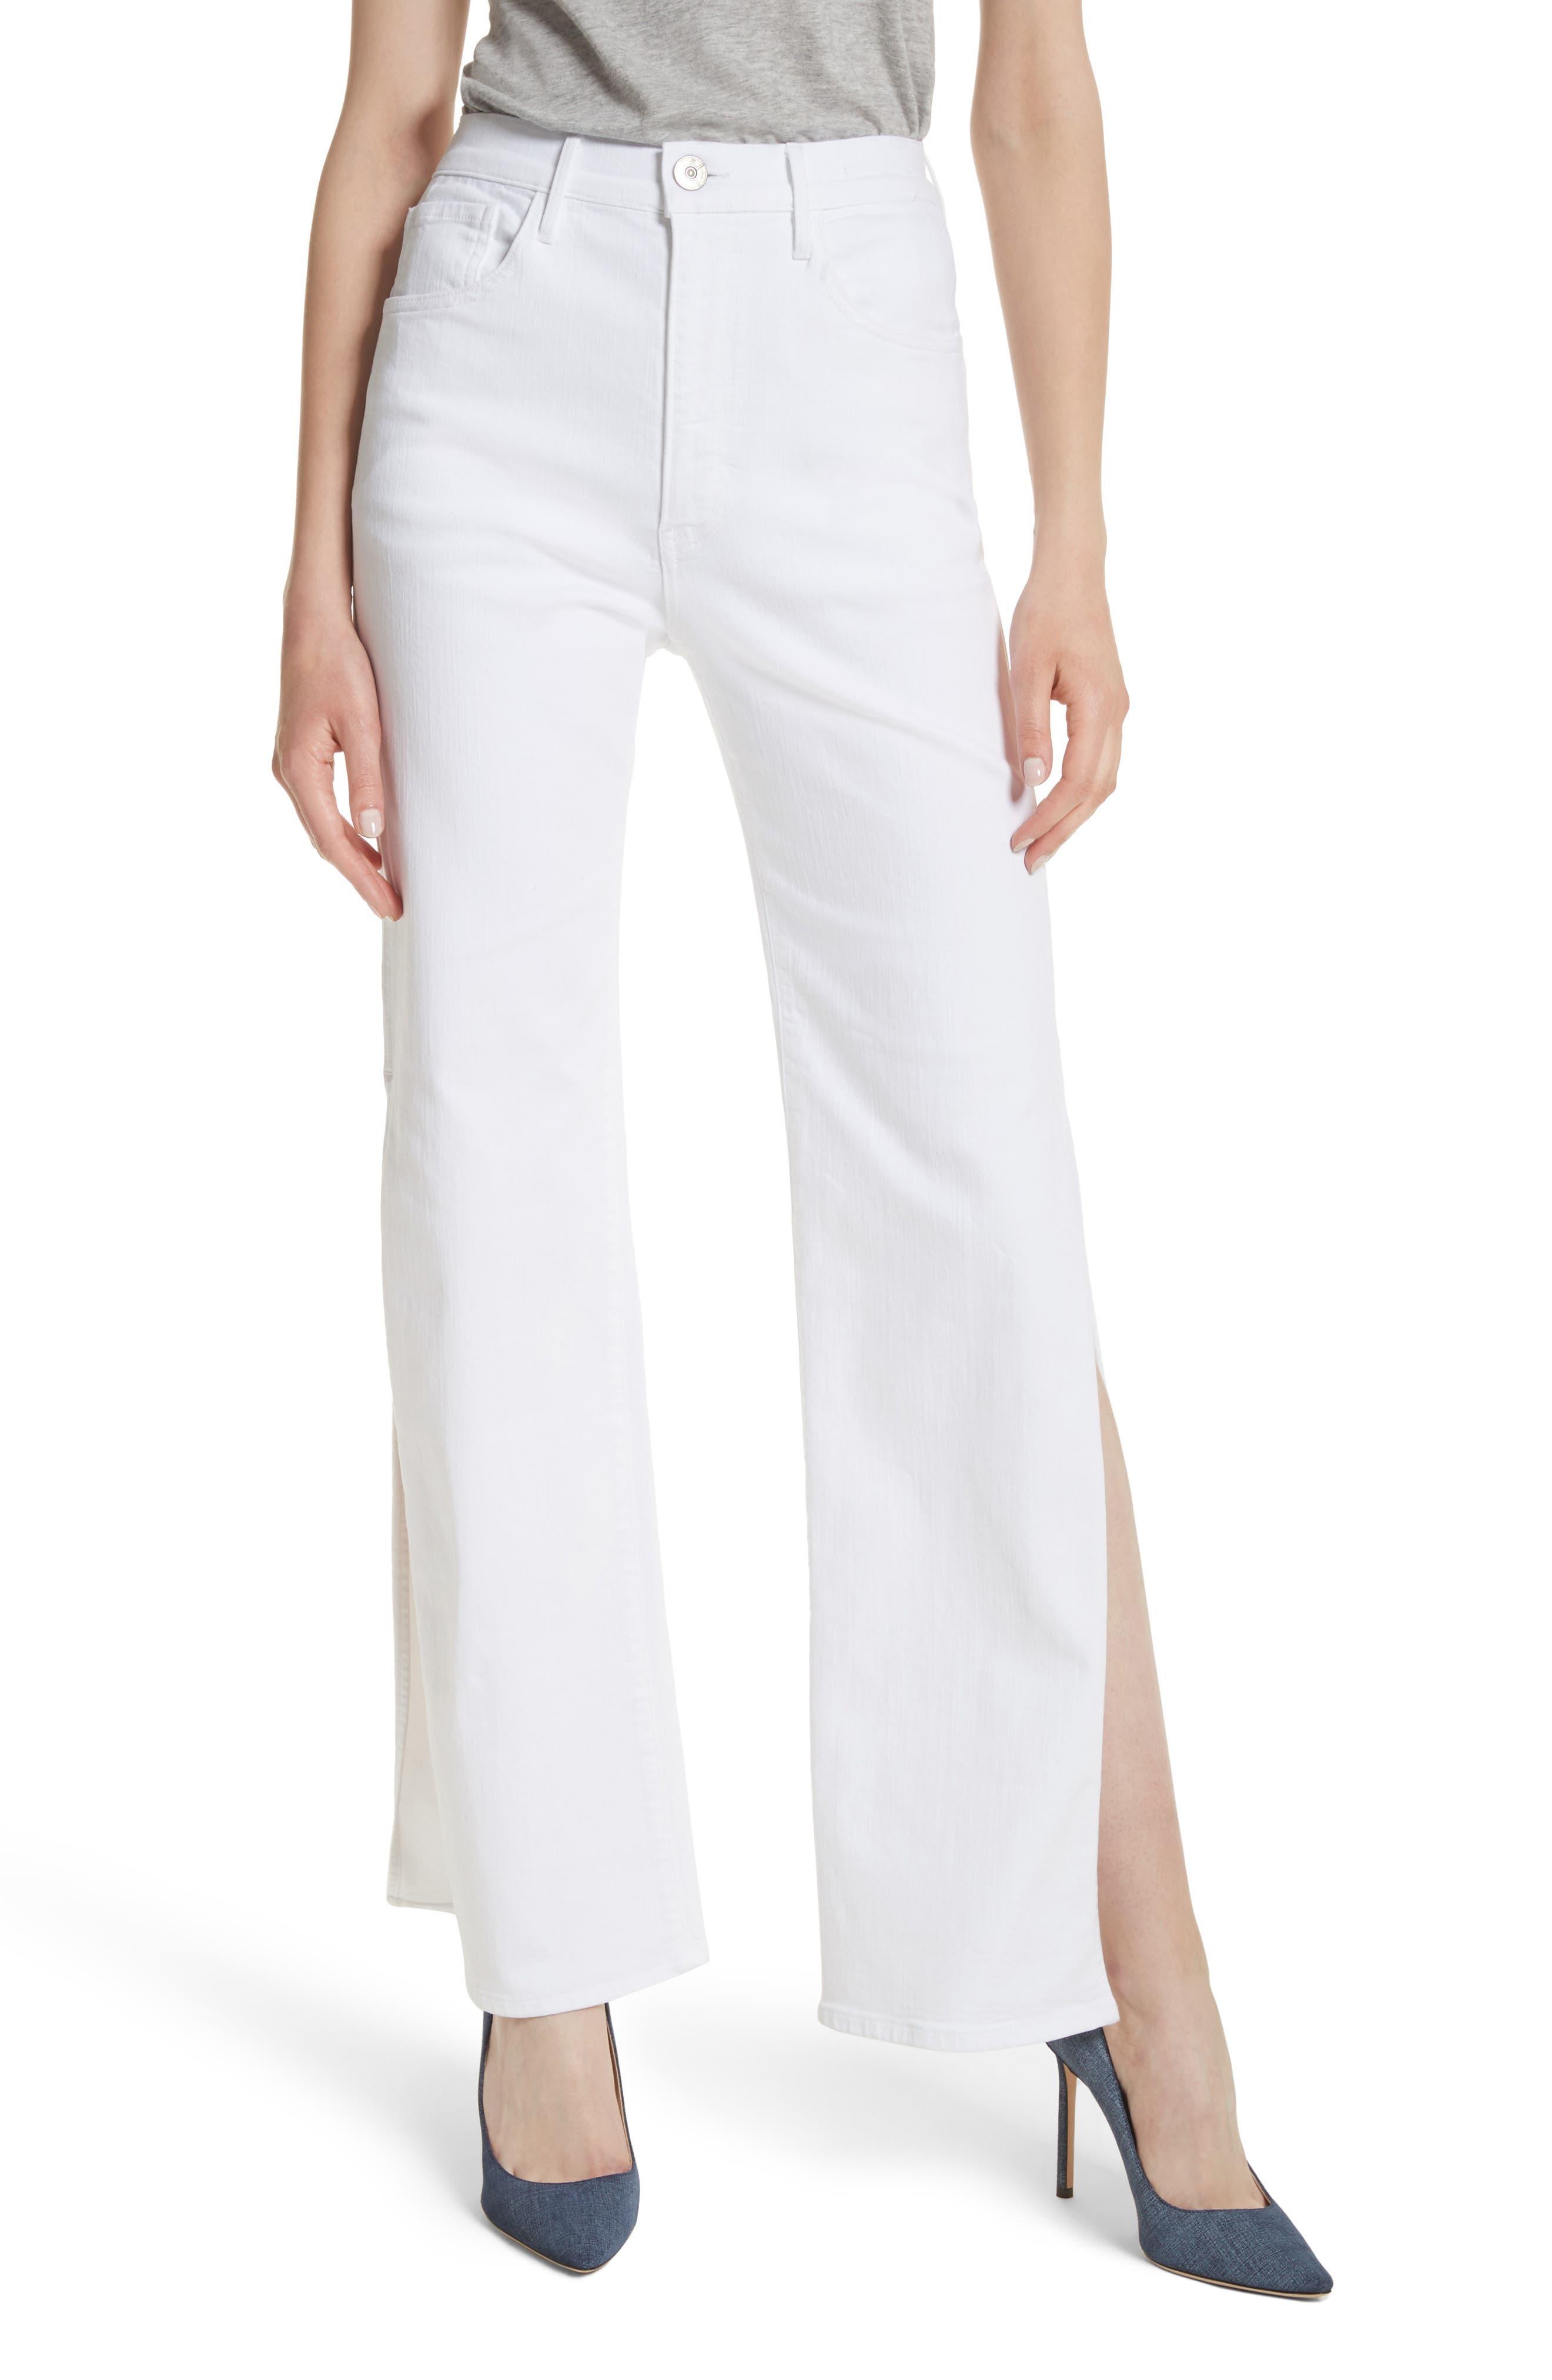 W4 Adeline Split Leg Flare Jeans,                             Main thumbnail 1, color,                             ASPRO